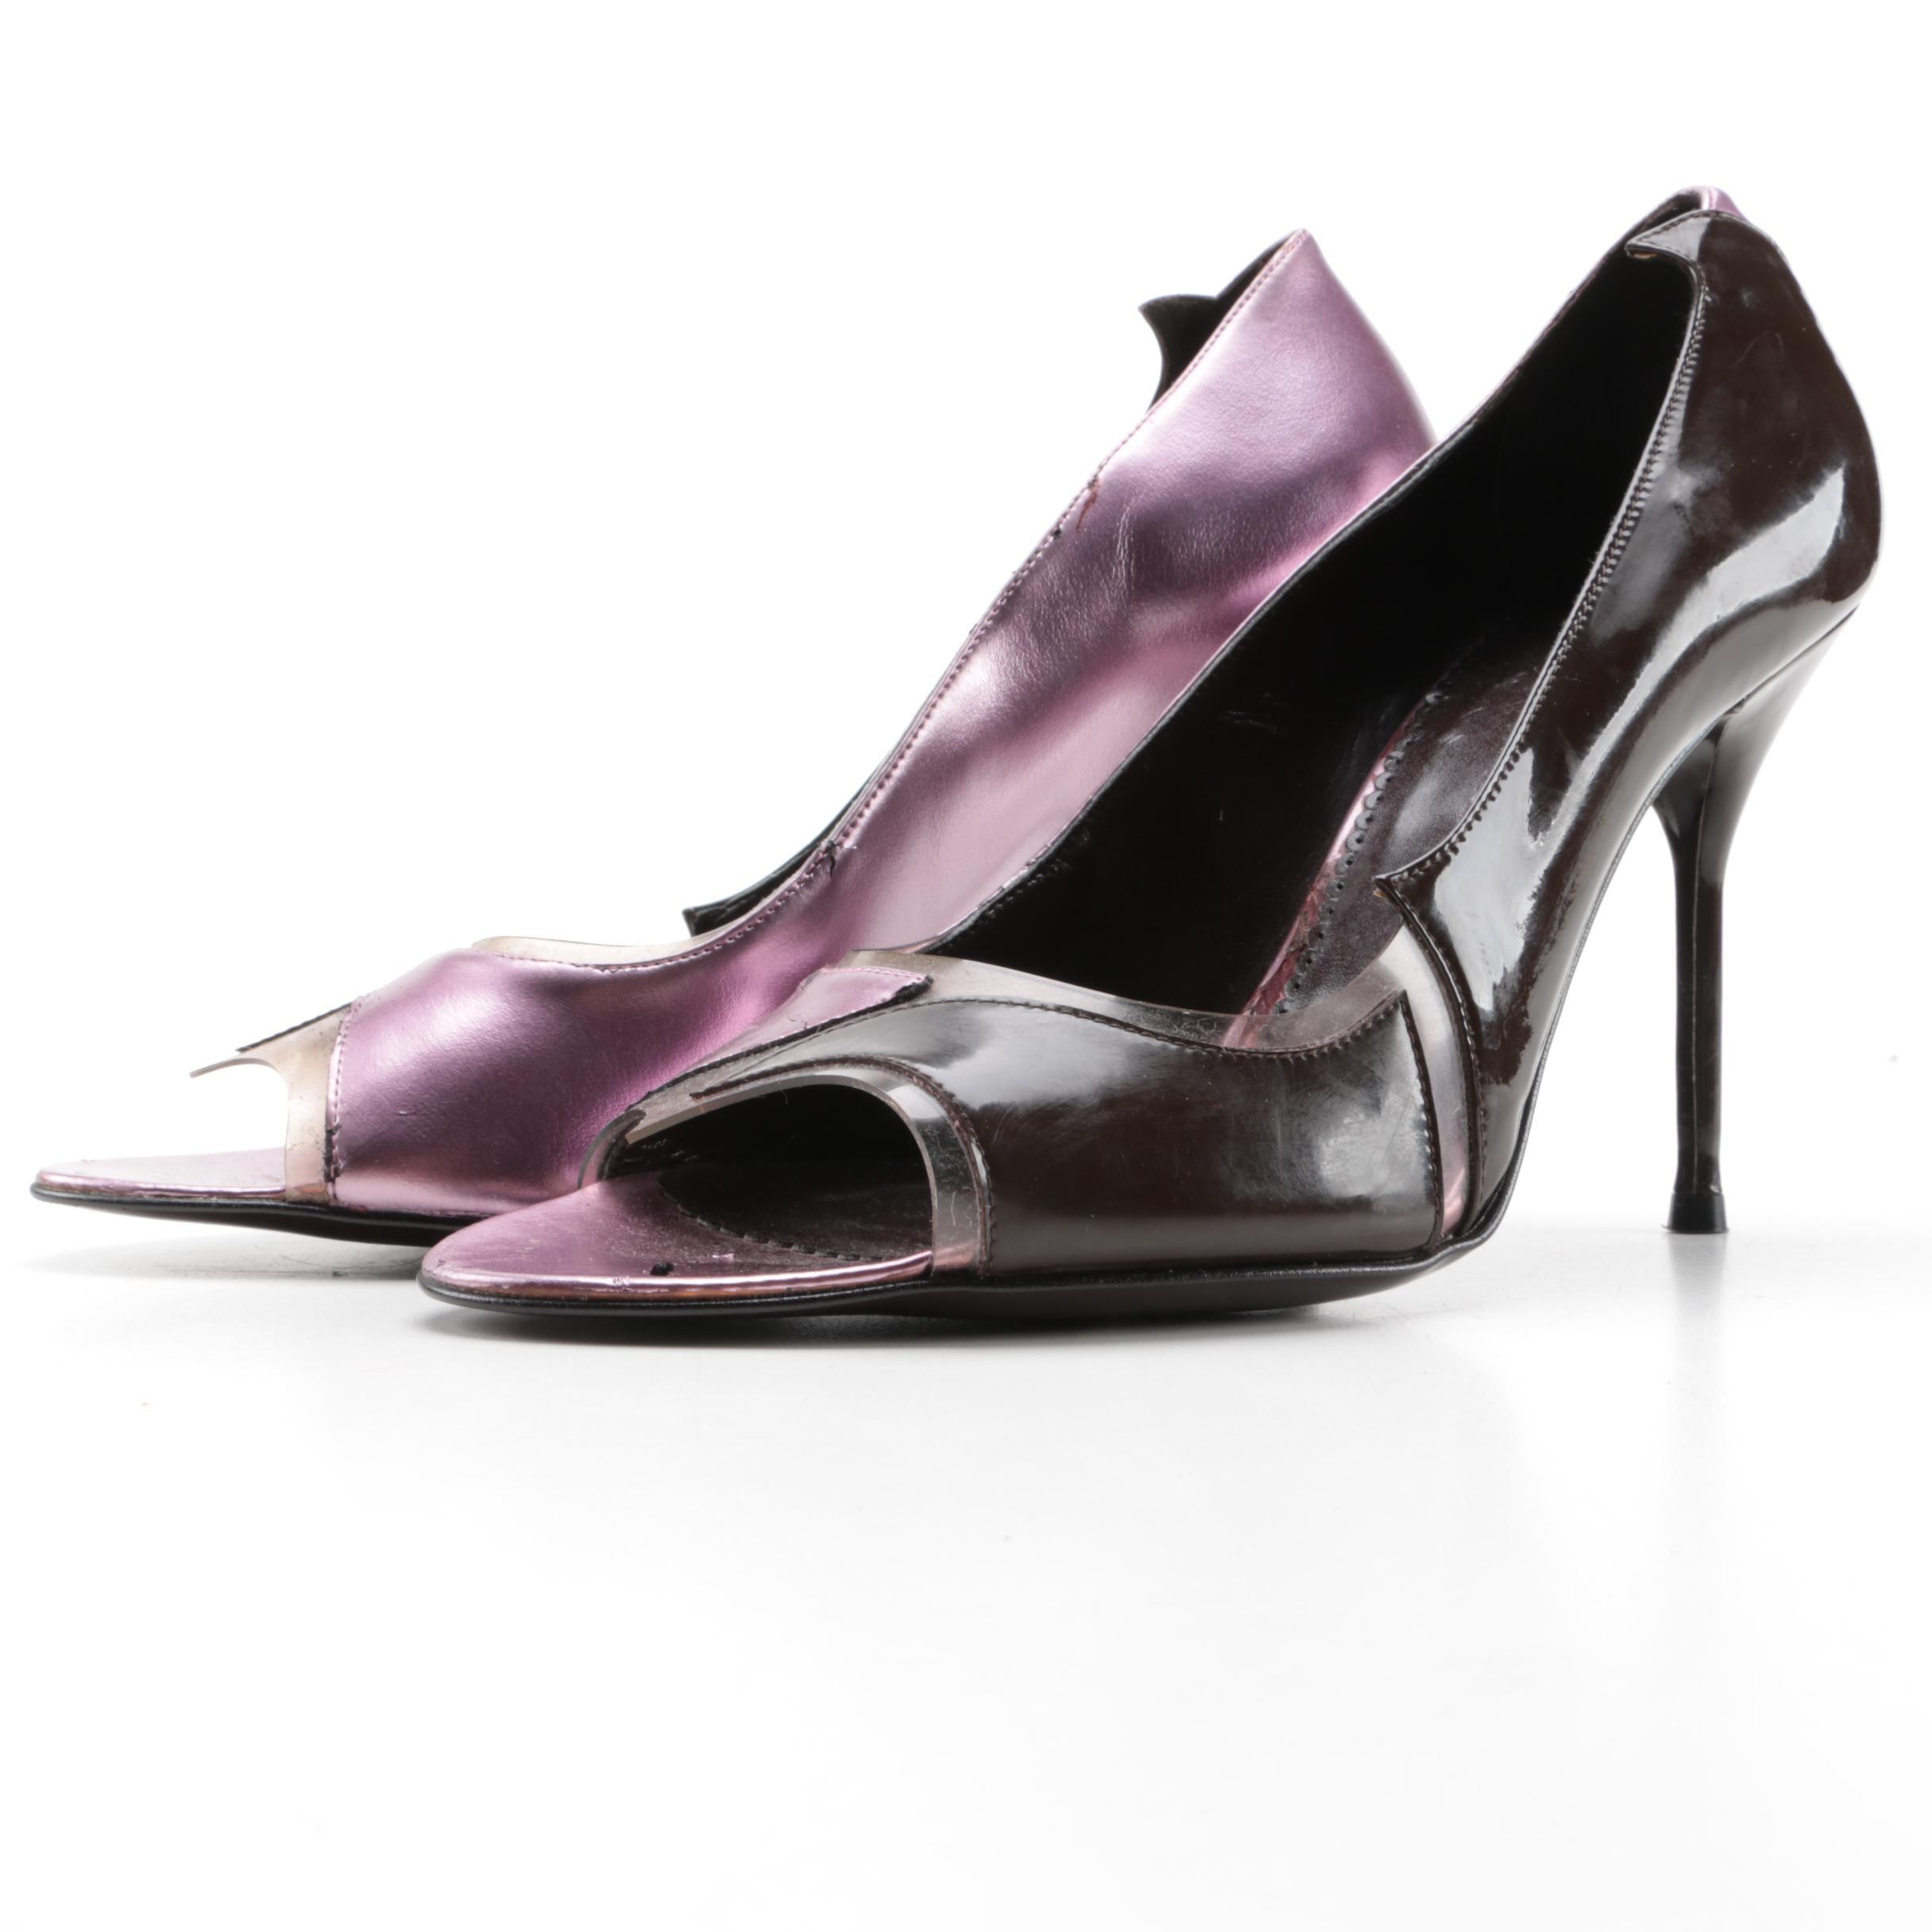 Stella McCartney Peep Toe Stiletto Heels